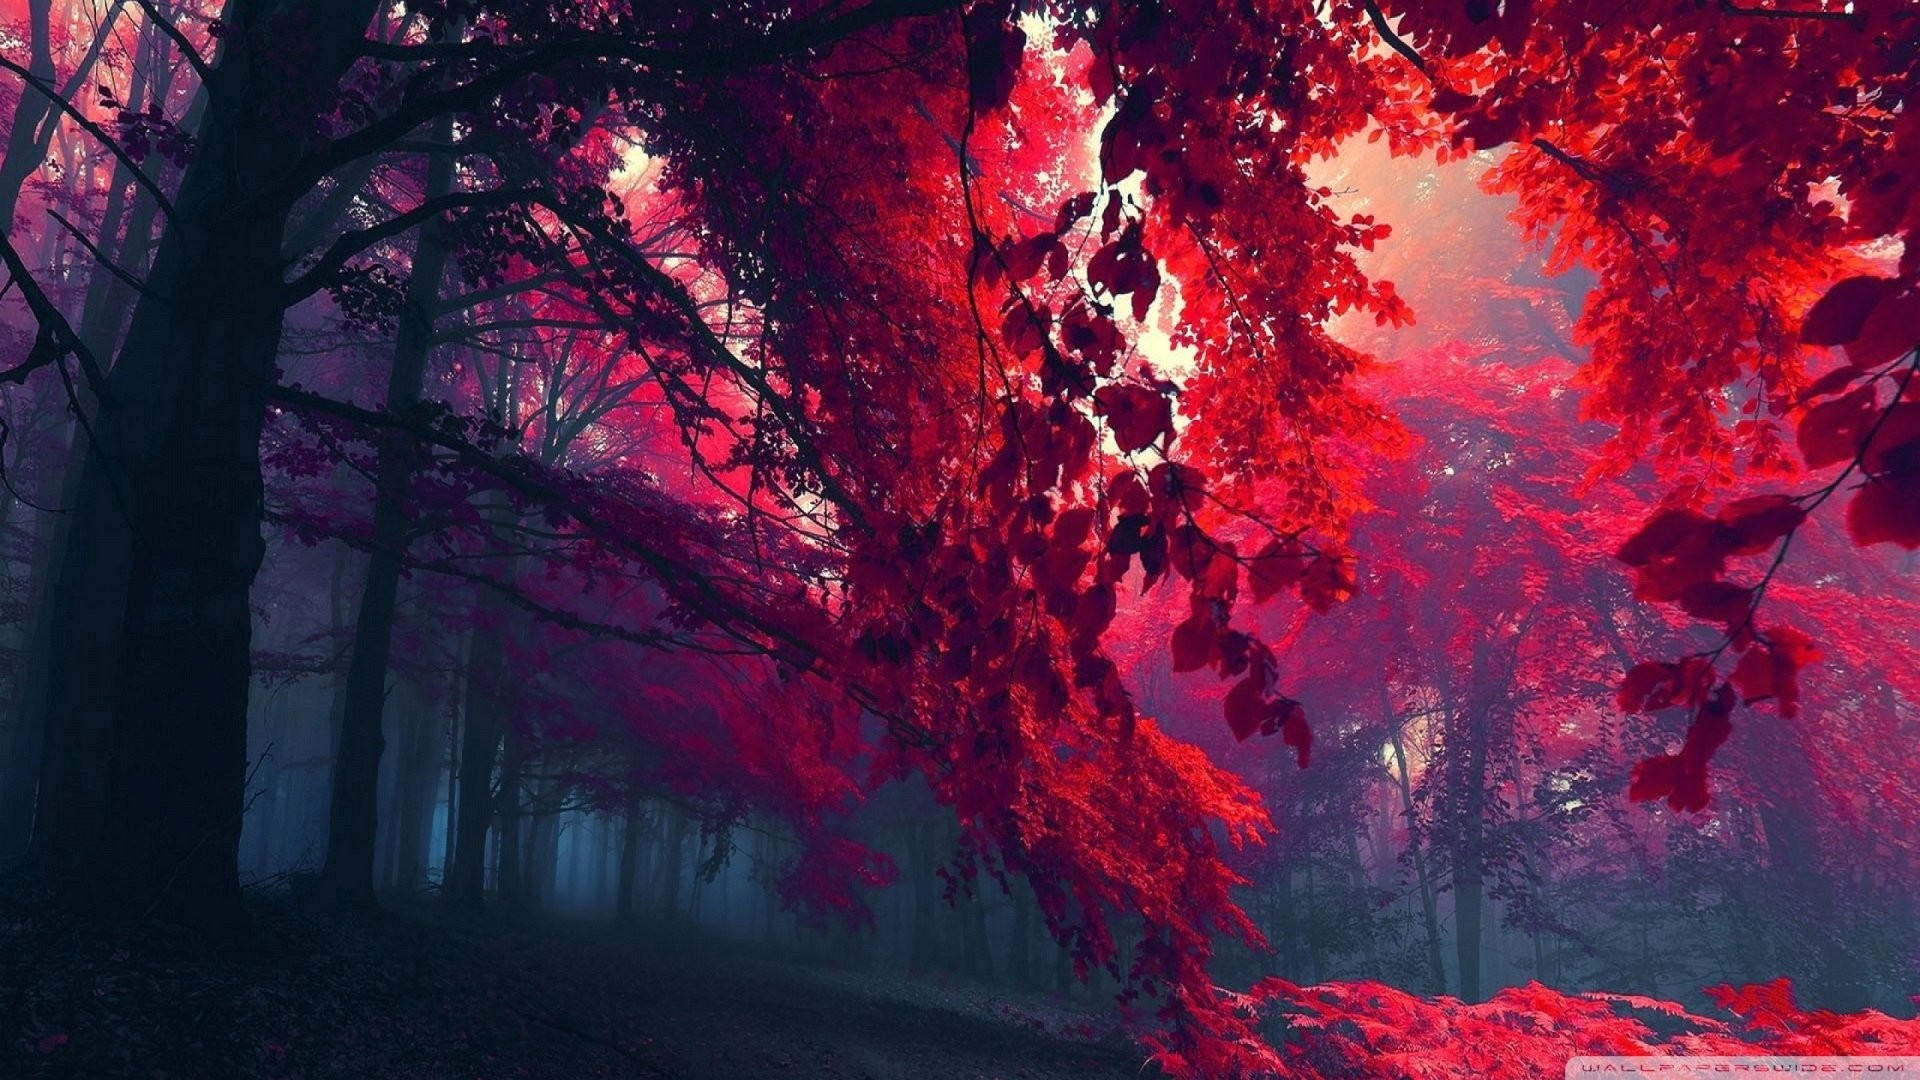 Wallpaper red leaves autumn 1920 x 1080 full hd